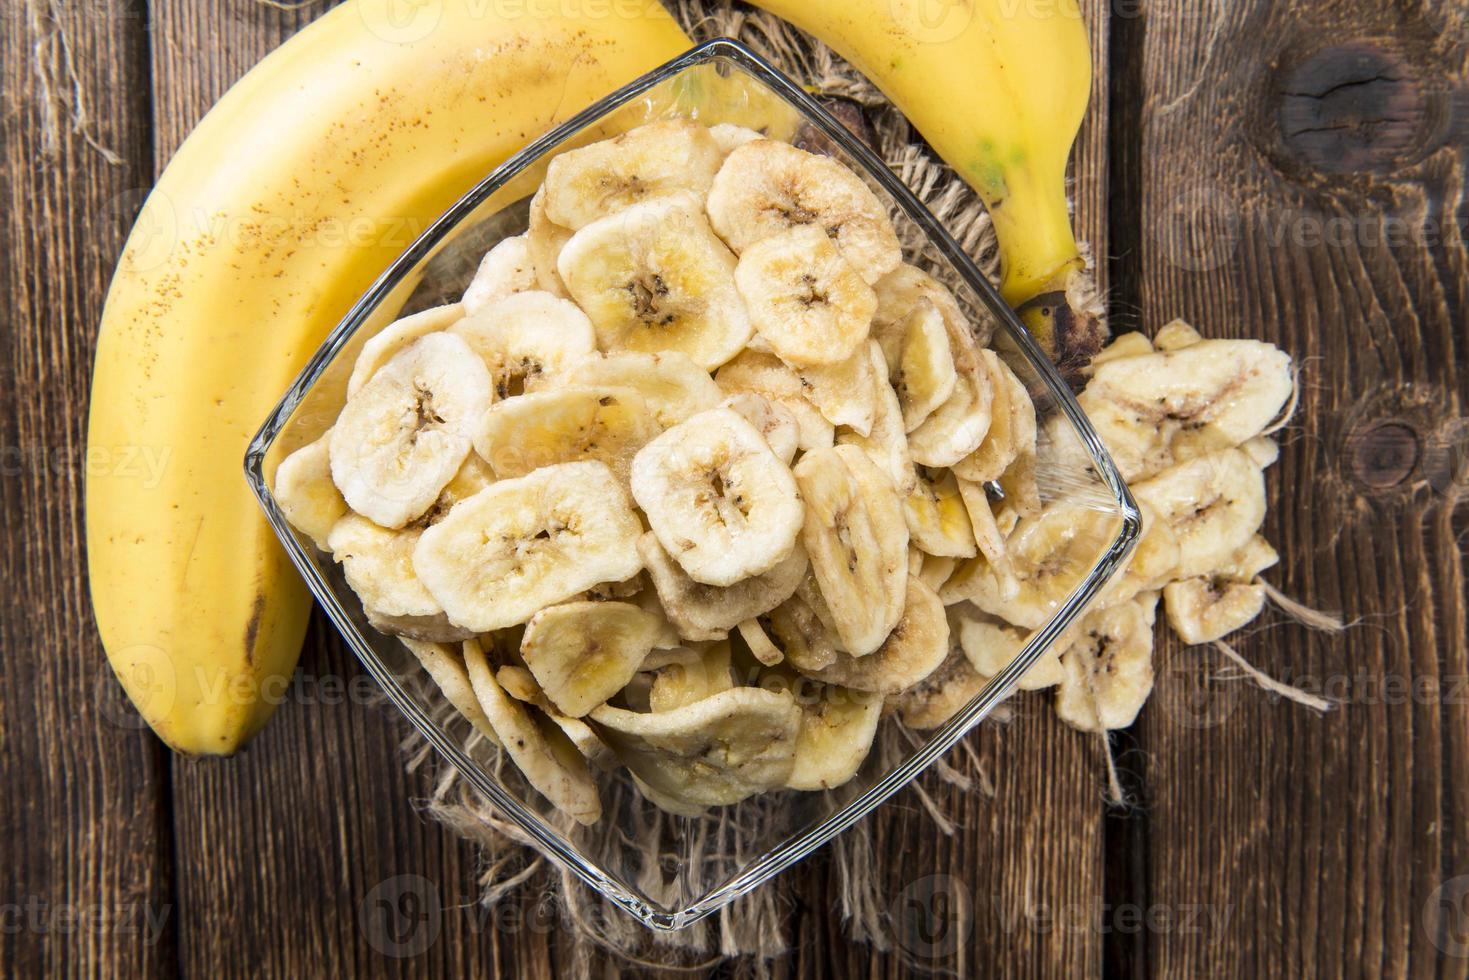 chips di banana (ripresa ravvicinata) foto